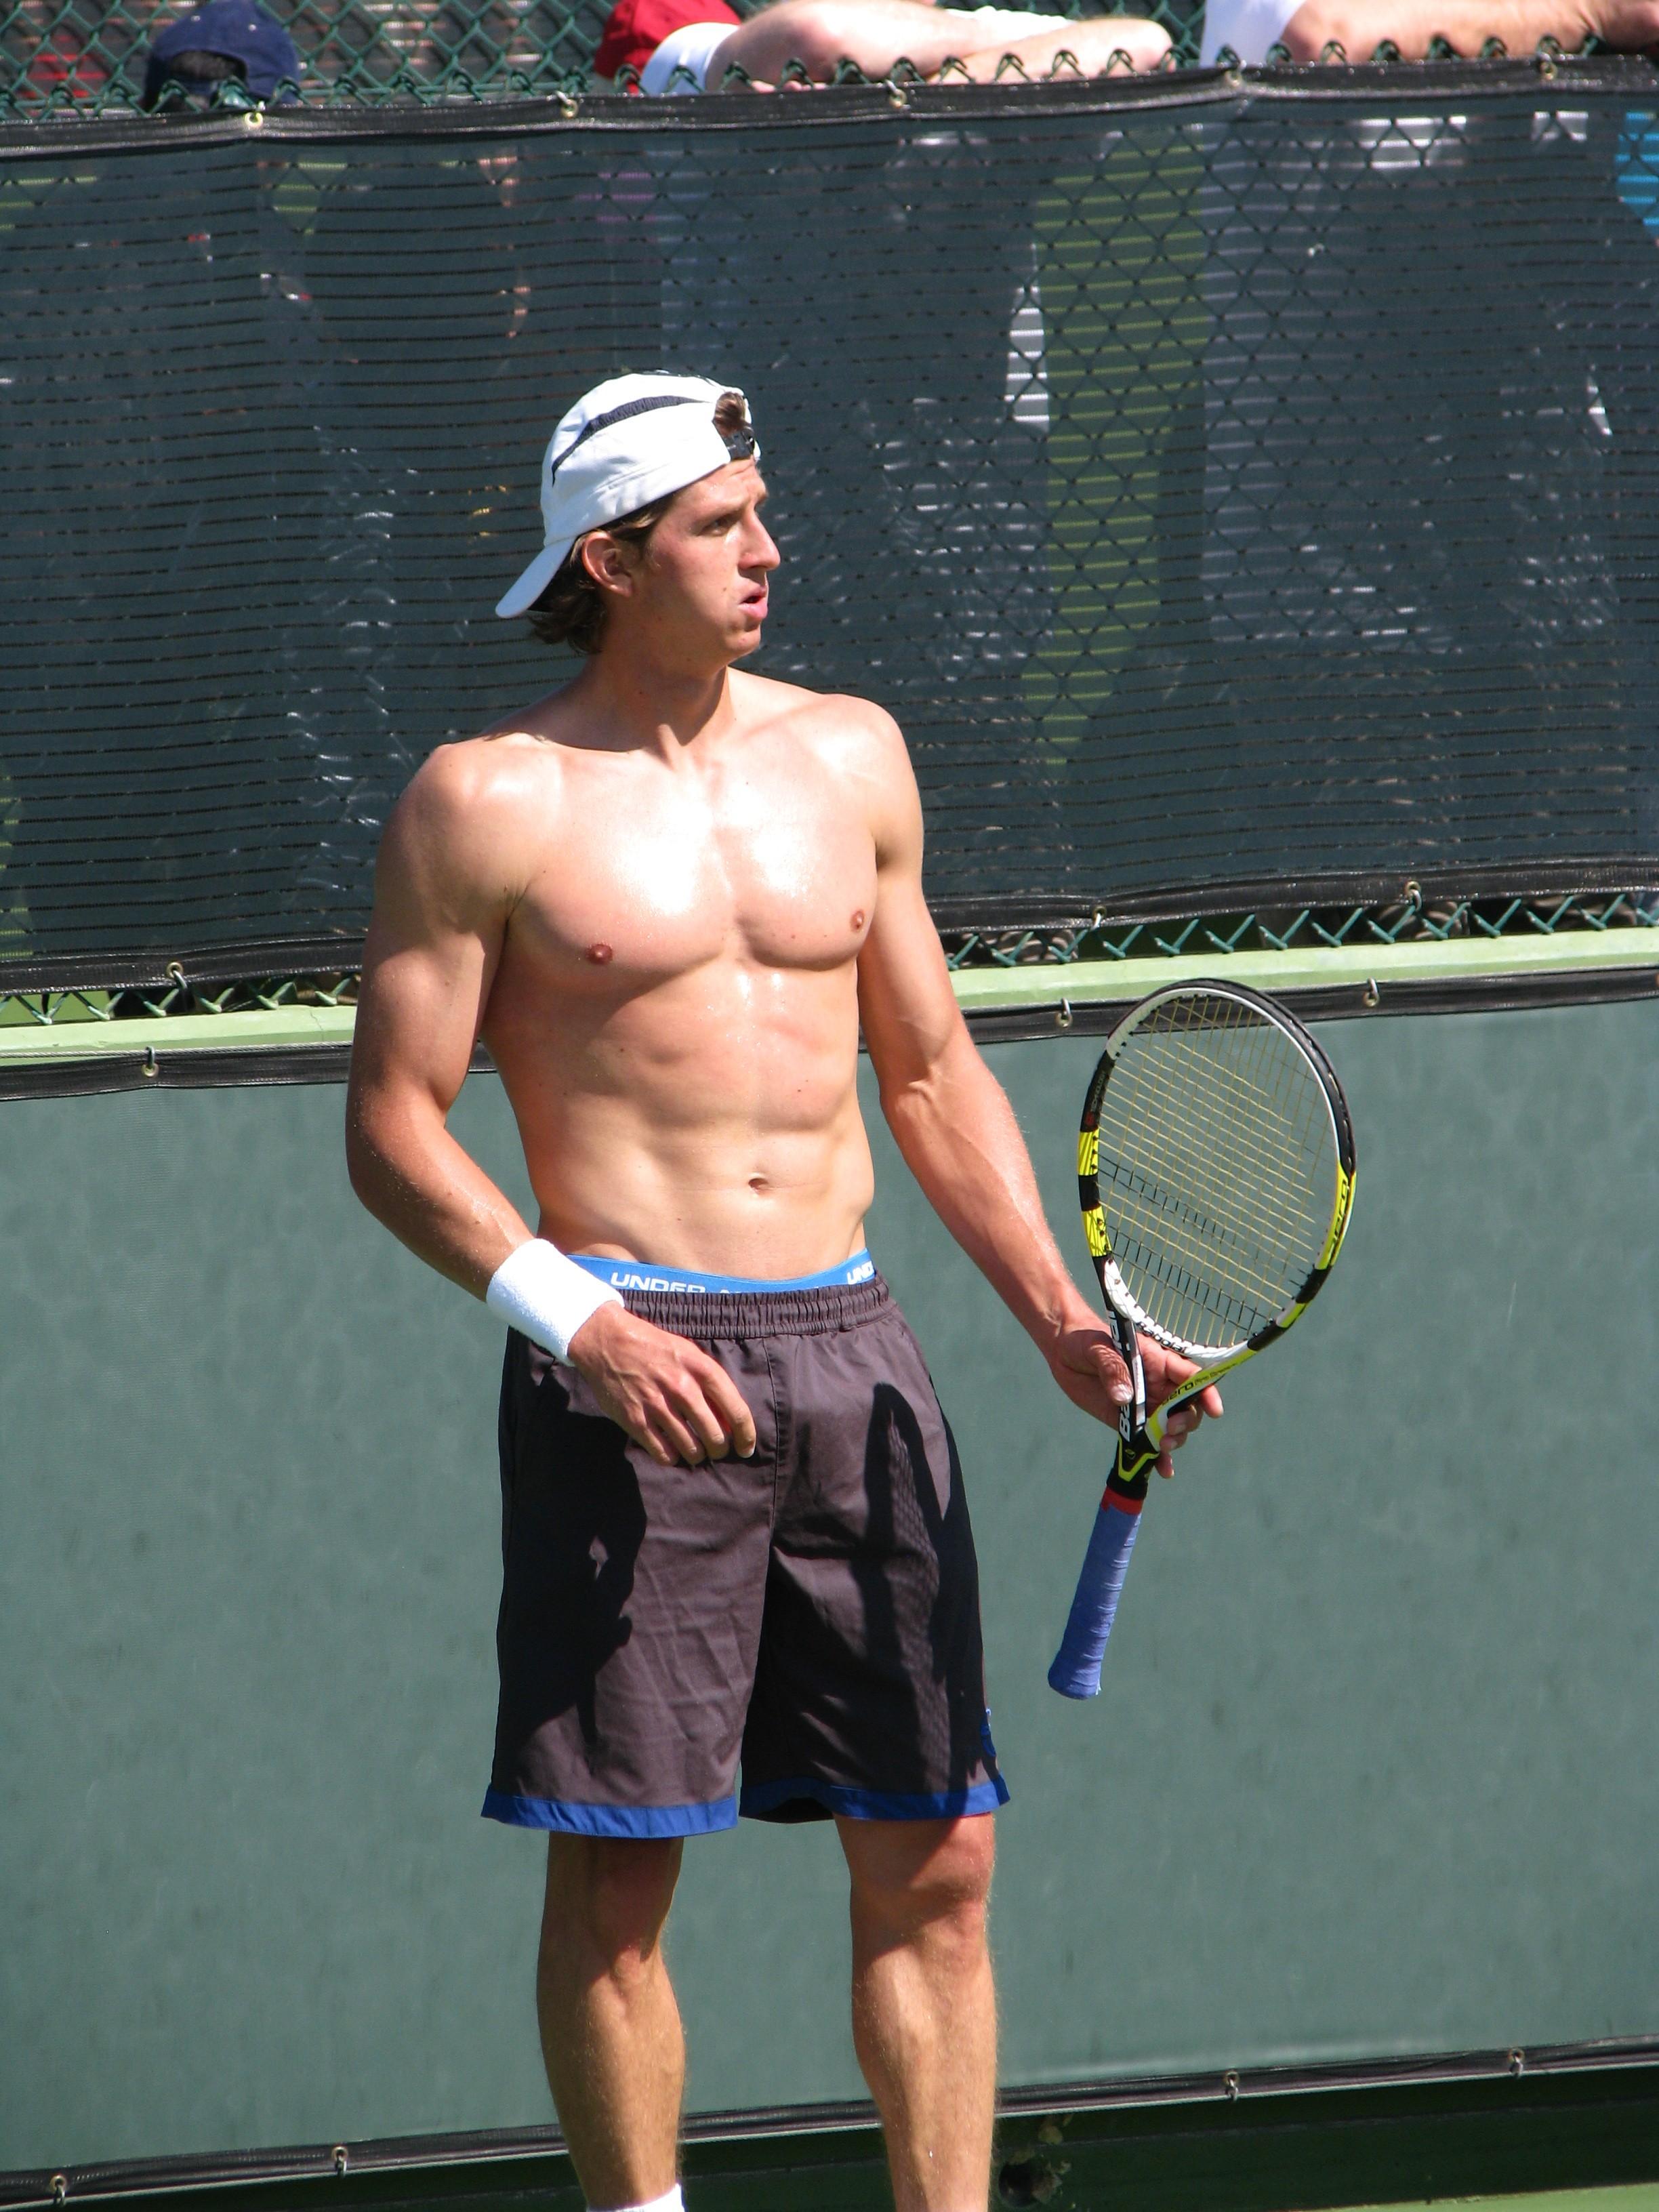 Tennis dating sites free 5